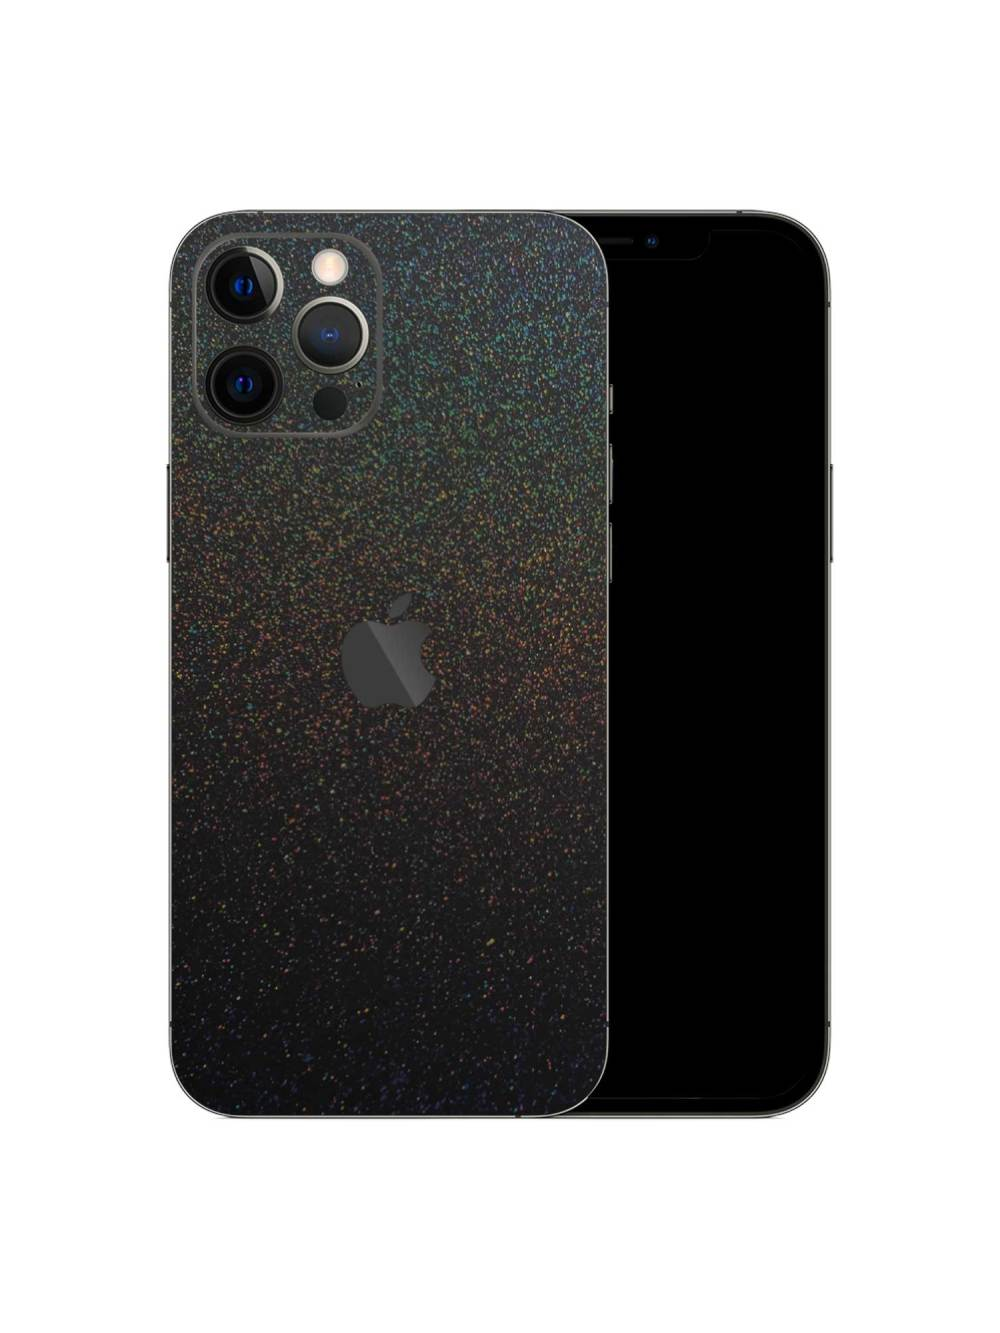 Apple iPhone 12 Pro Cosmic Morpheus Skin Wrap Vinyl